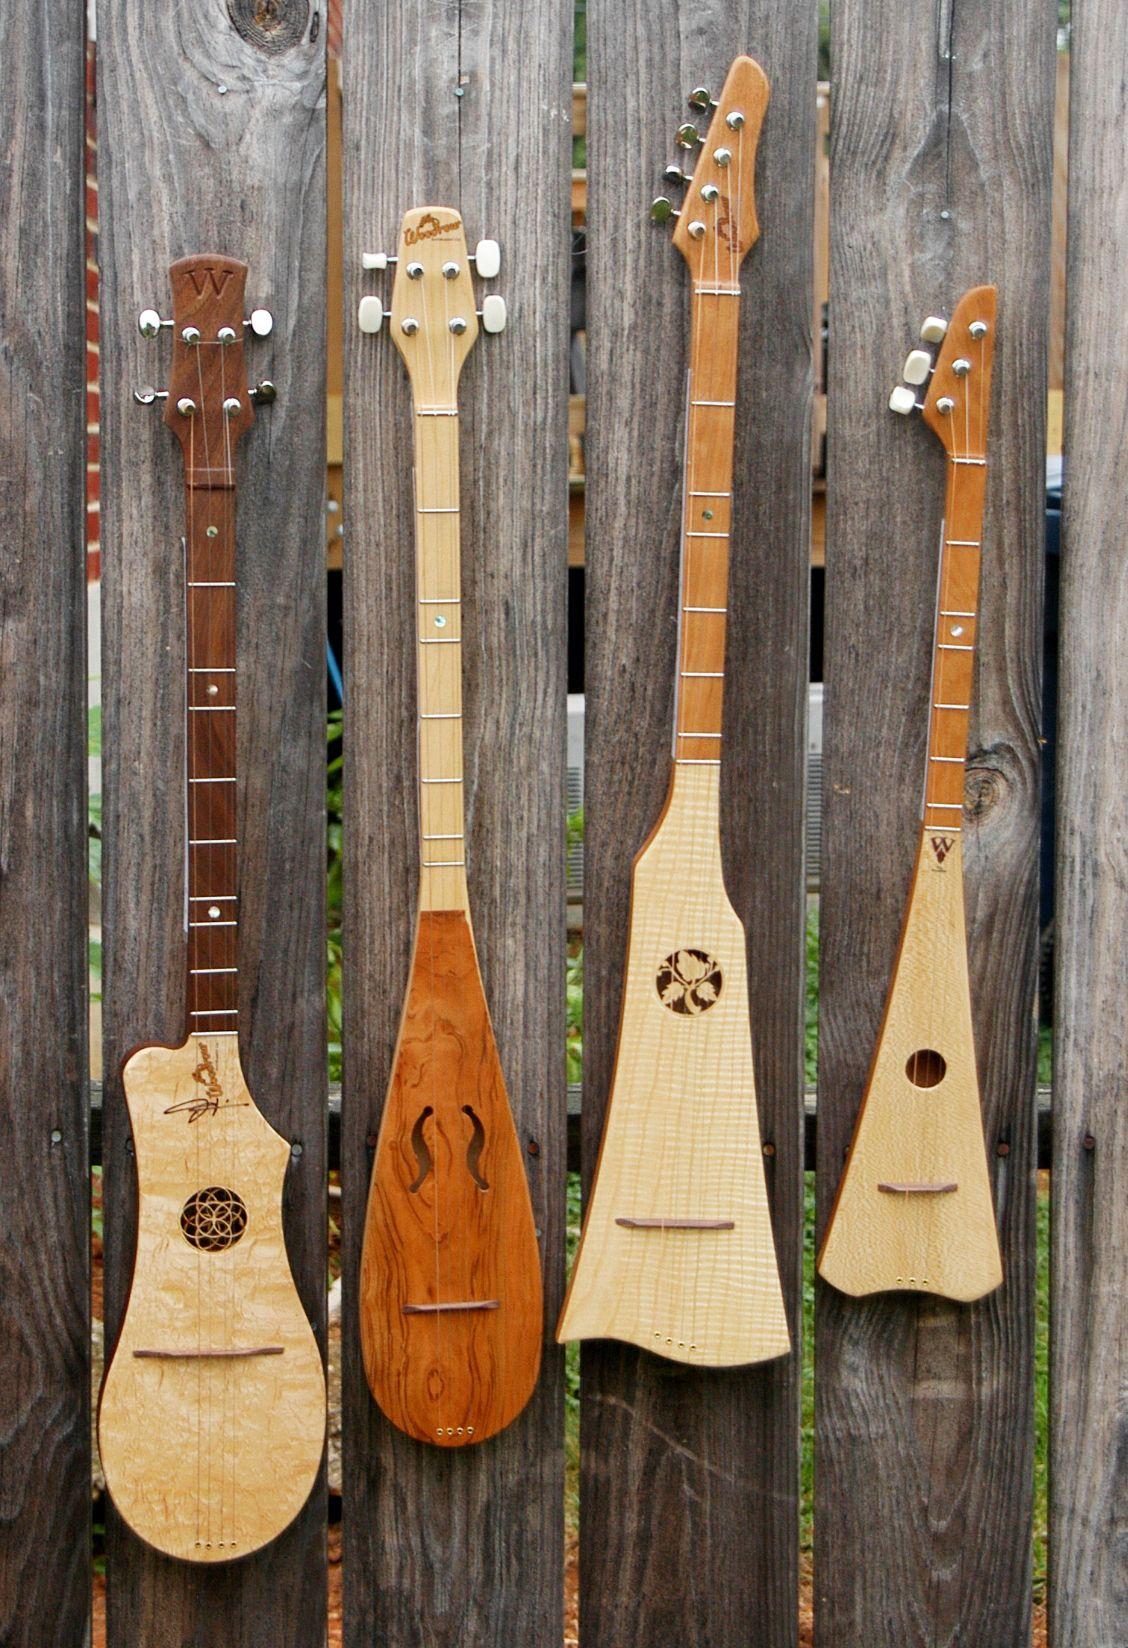 Handmade String Instruments Wooden Guitars Banjos The Woodrow